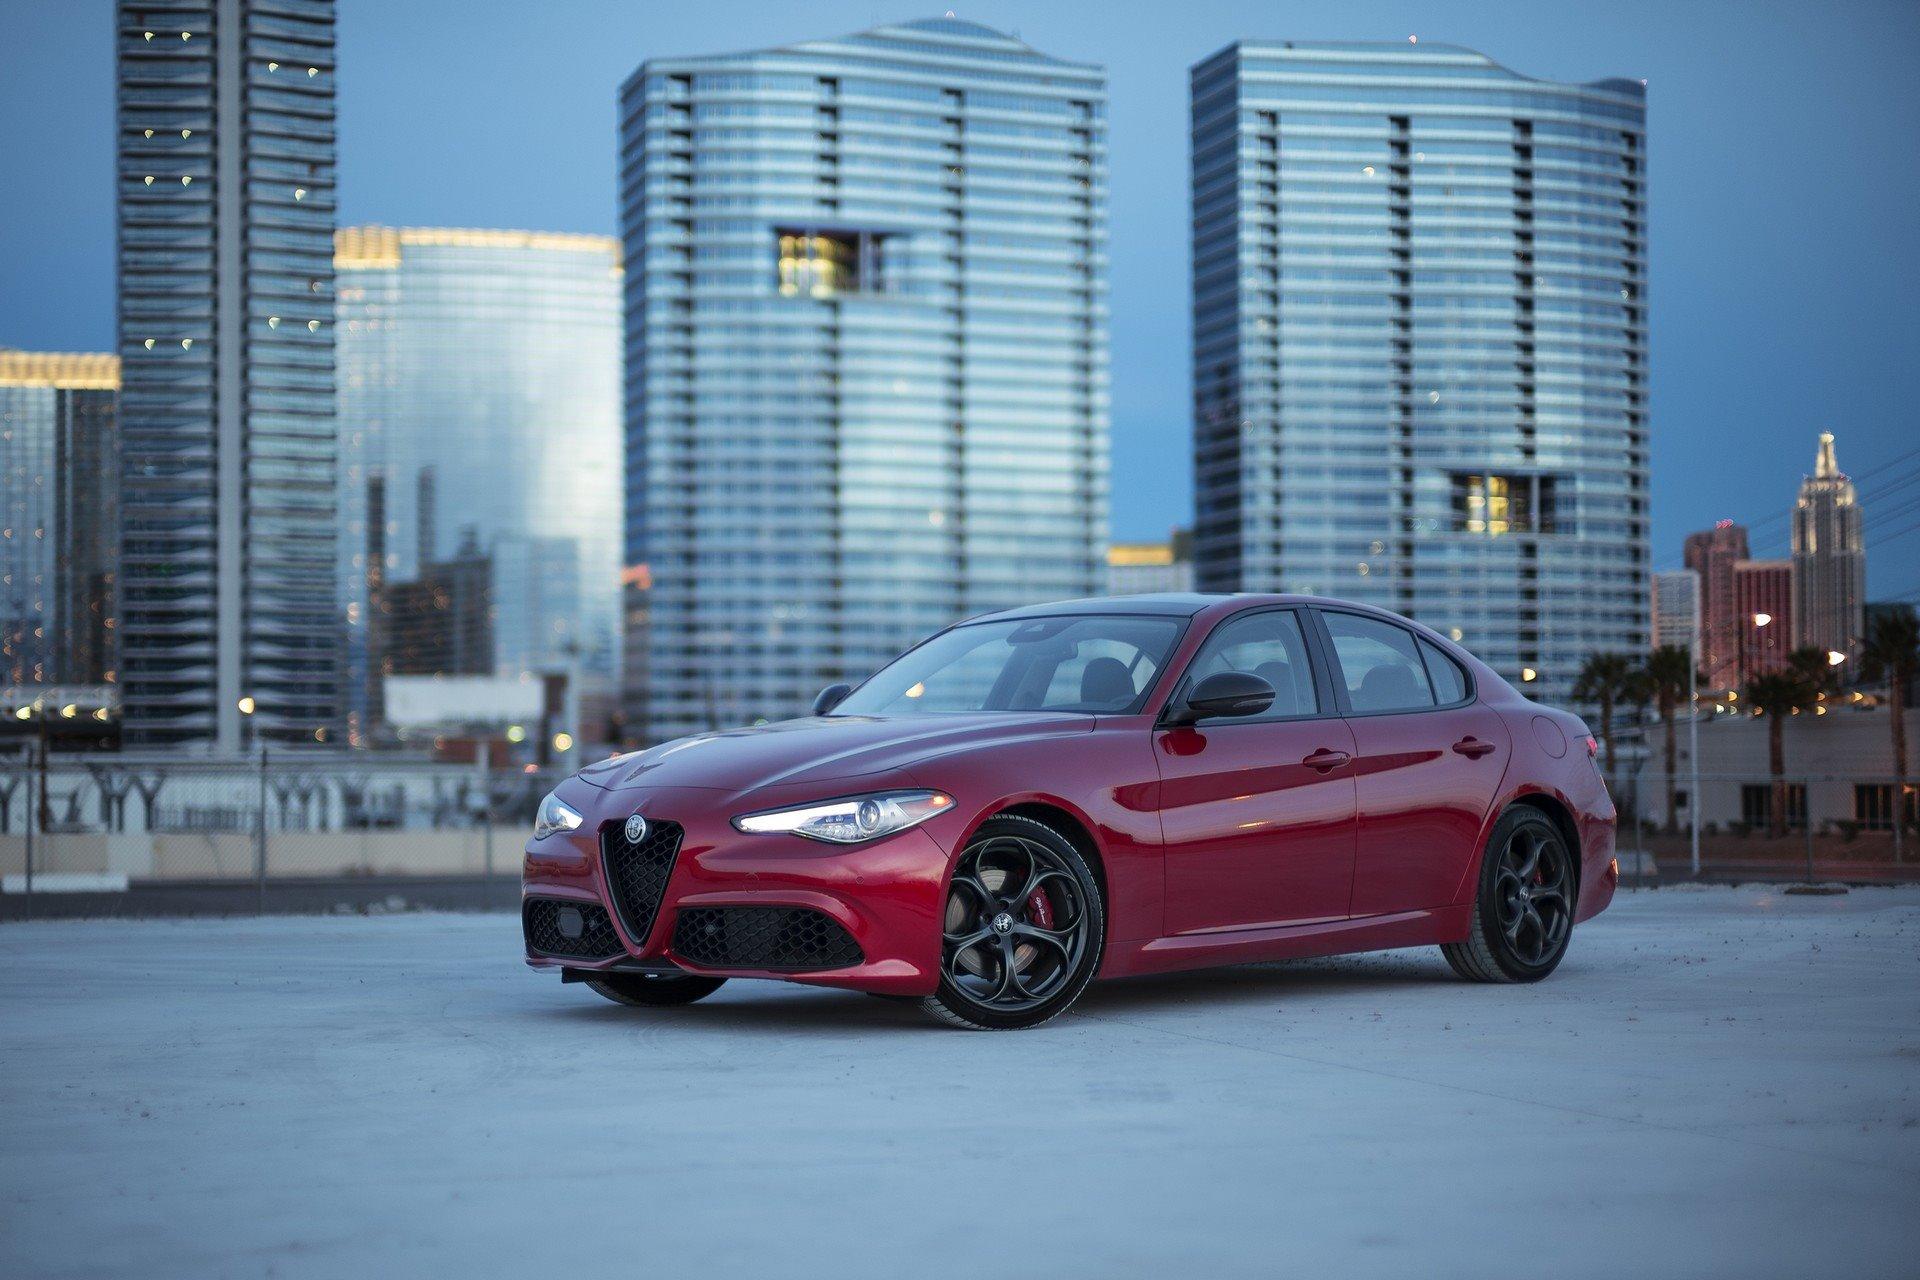 New 2020 Alfa Romeo-Giulia Base Giulia for sale $40,295 at M and V Leasing in Brooklyn NY 11223 1